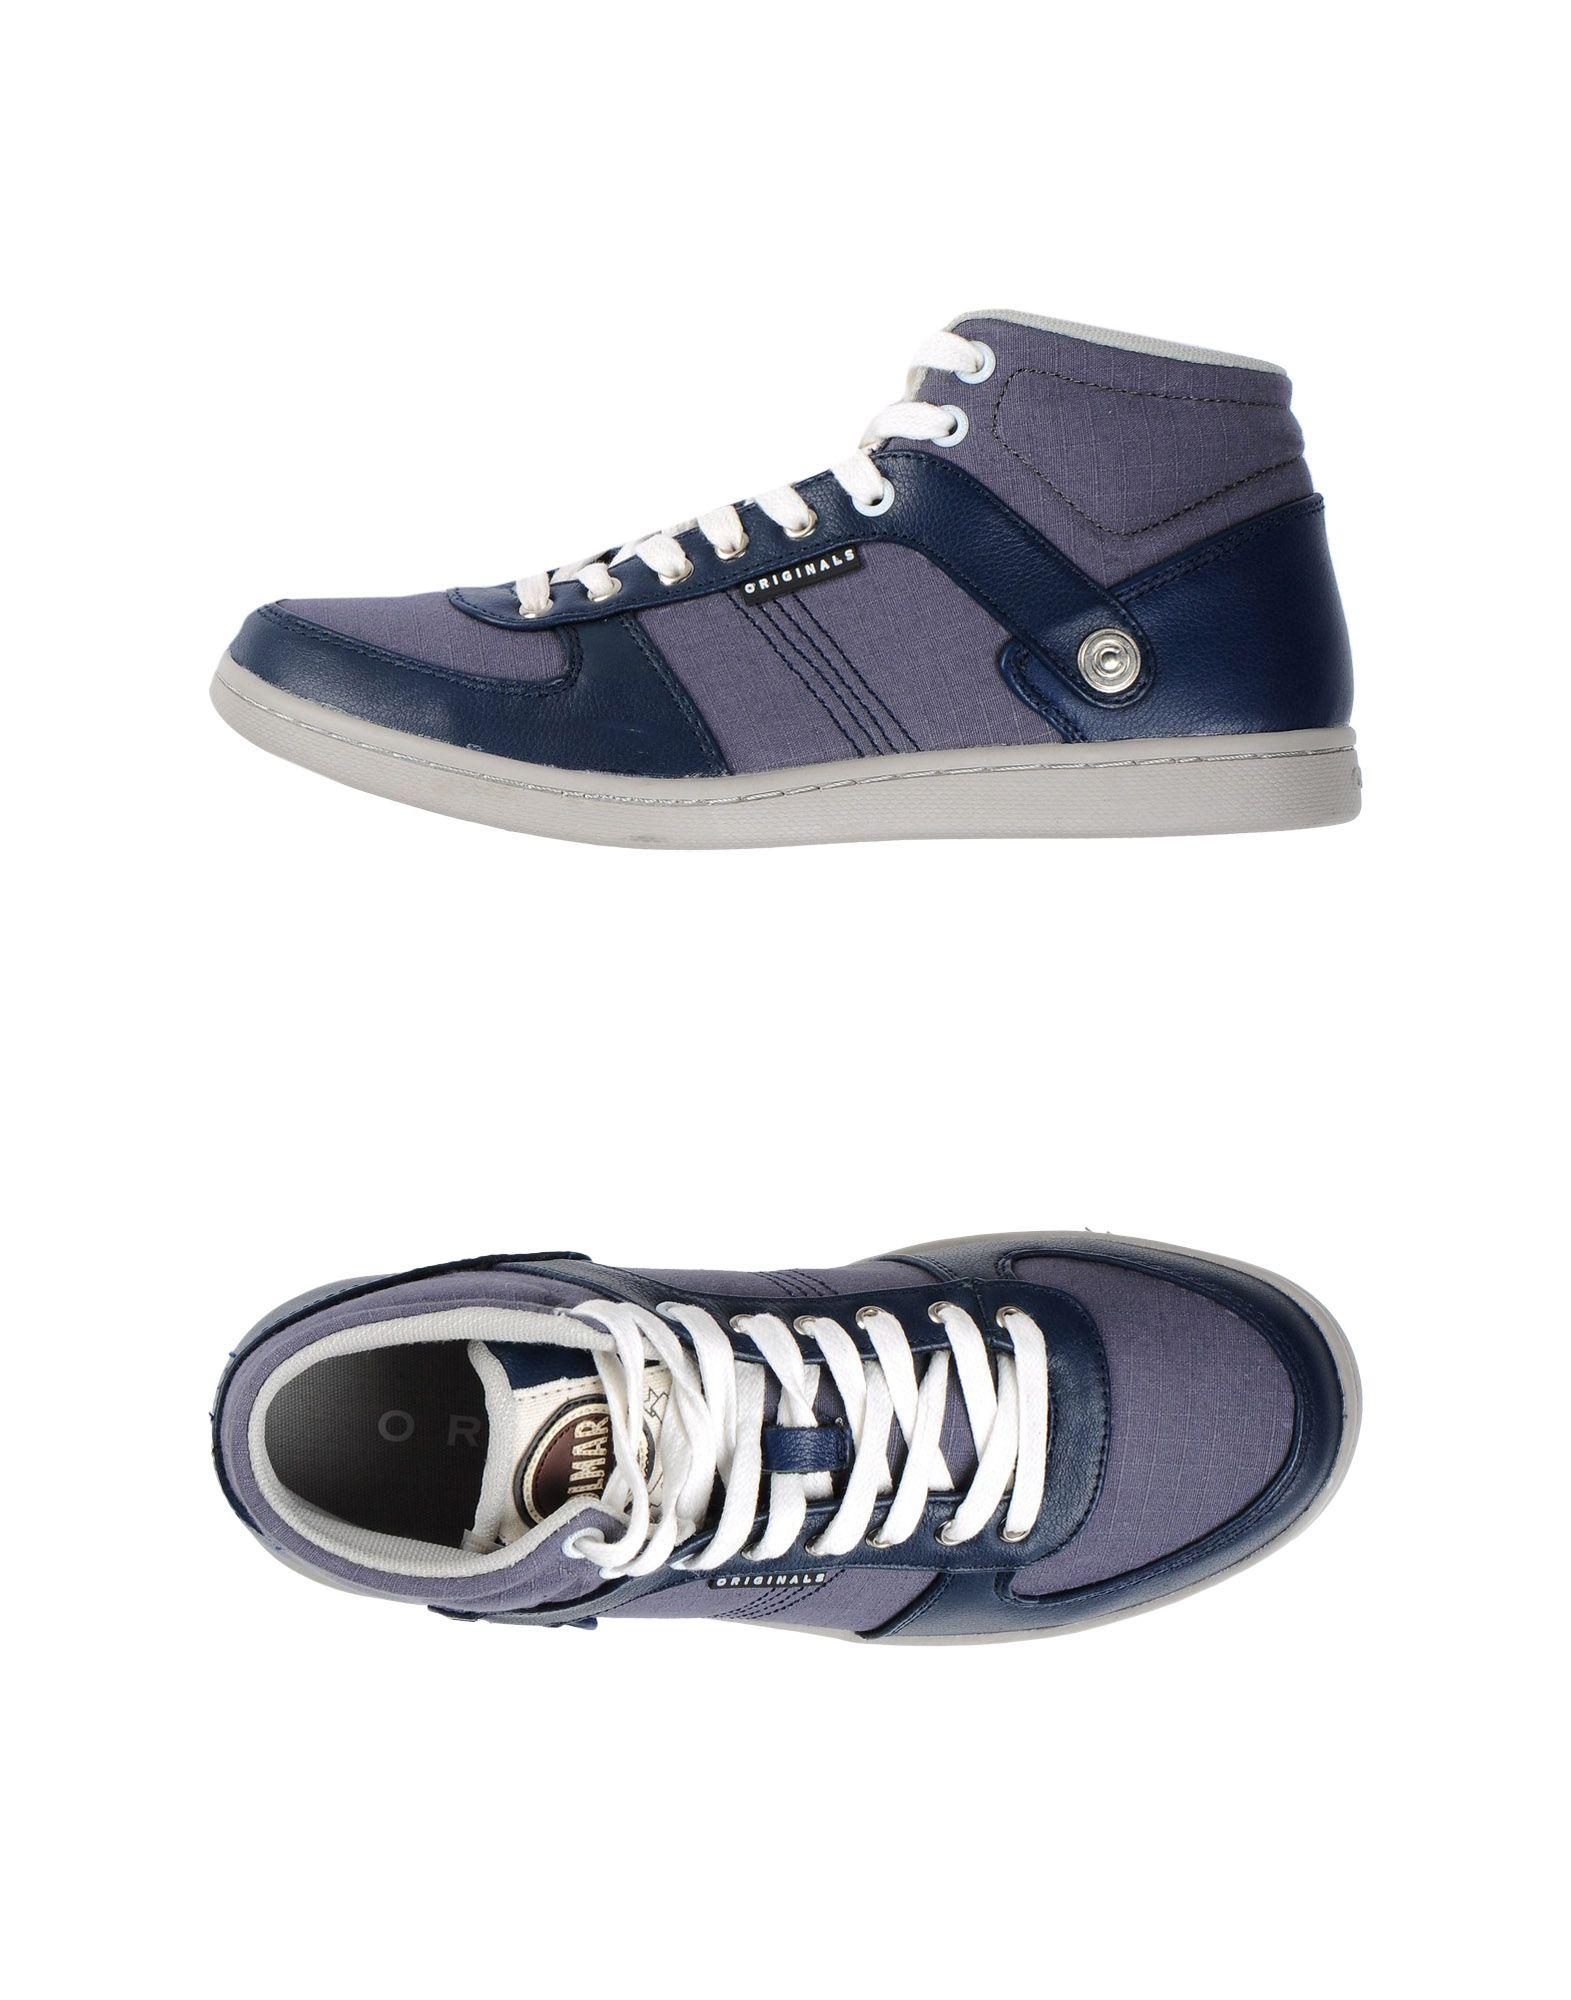 COLMAR Высокие кеды и кроссовки кеды кроссовки высокие женские dc rebound high se silver